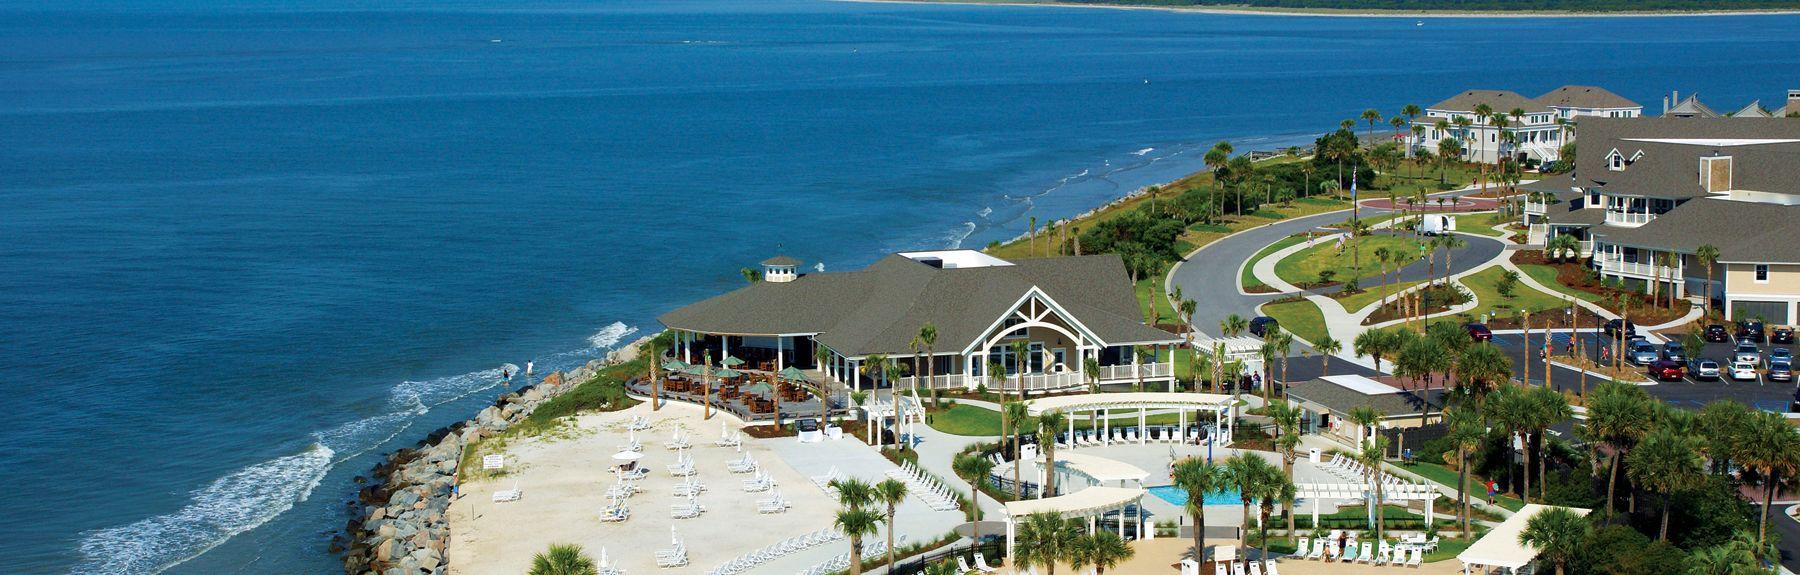 Sealoft Villas, Seabrook Island, SC, USA